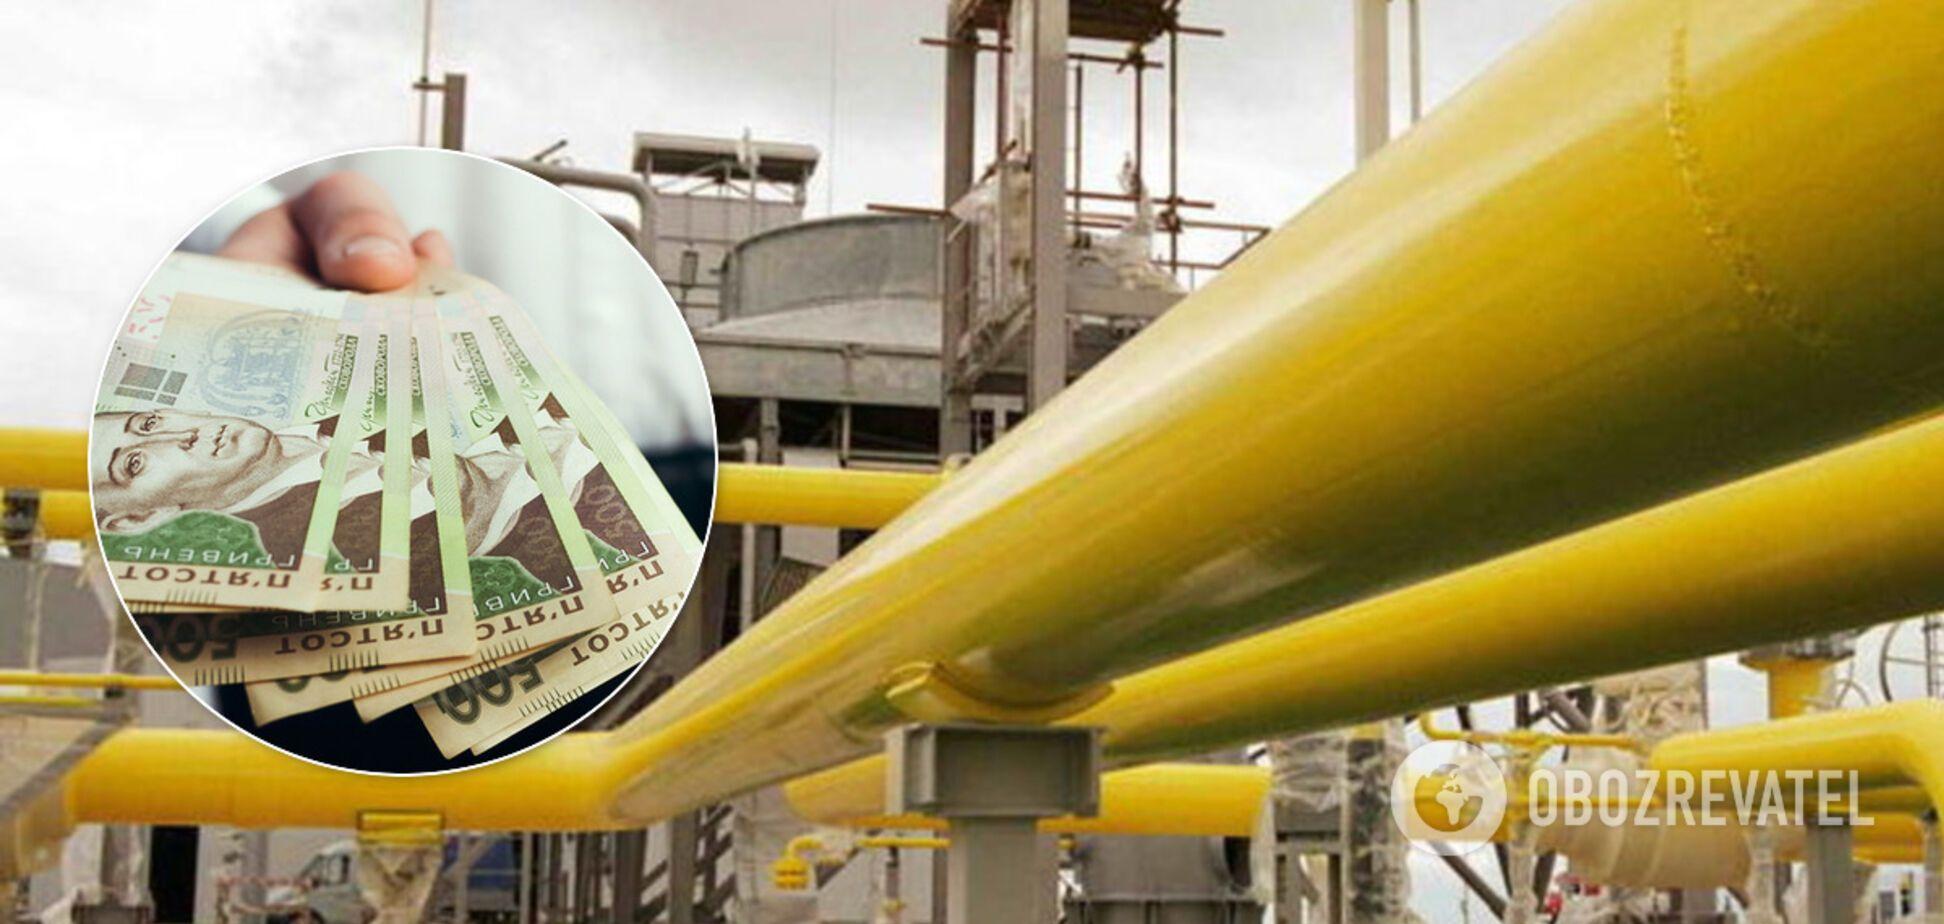 'Газпром' рекордно снизил транзит газа через Украину: поставки упали до исторического минимума